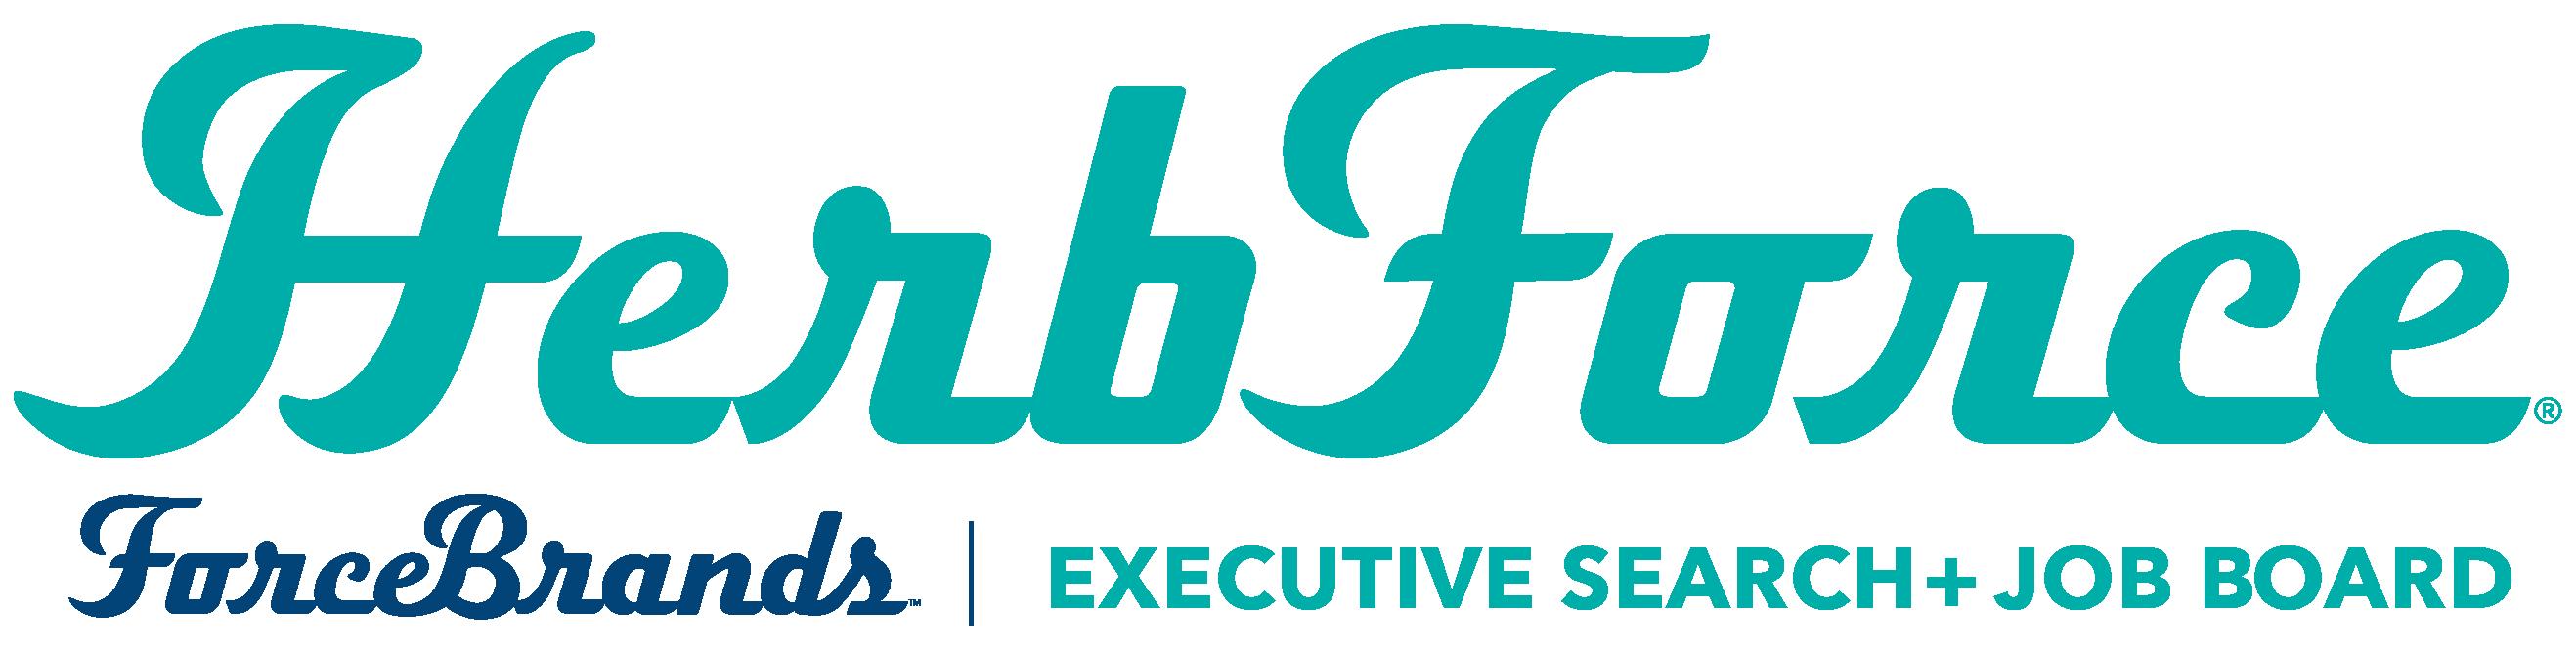 HerbForce - sponsoring Cannabis Forum Summer 2019